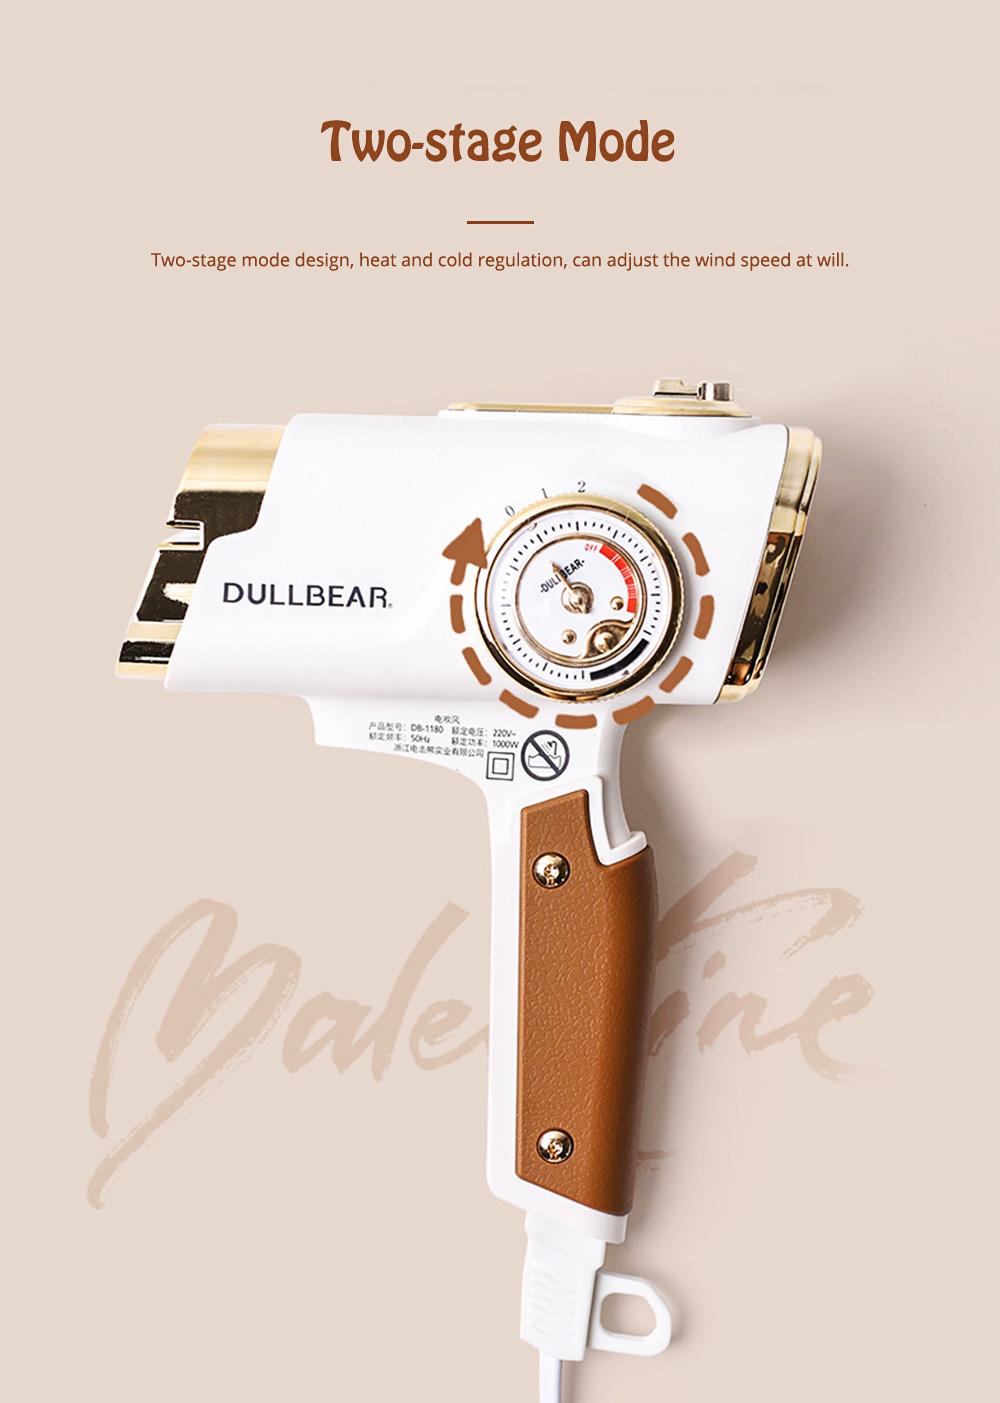 DULLBEAR Negative Ion Hair Dryer Small Portable Folding Home Travel Hairdryer 1